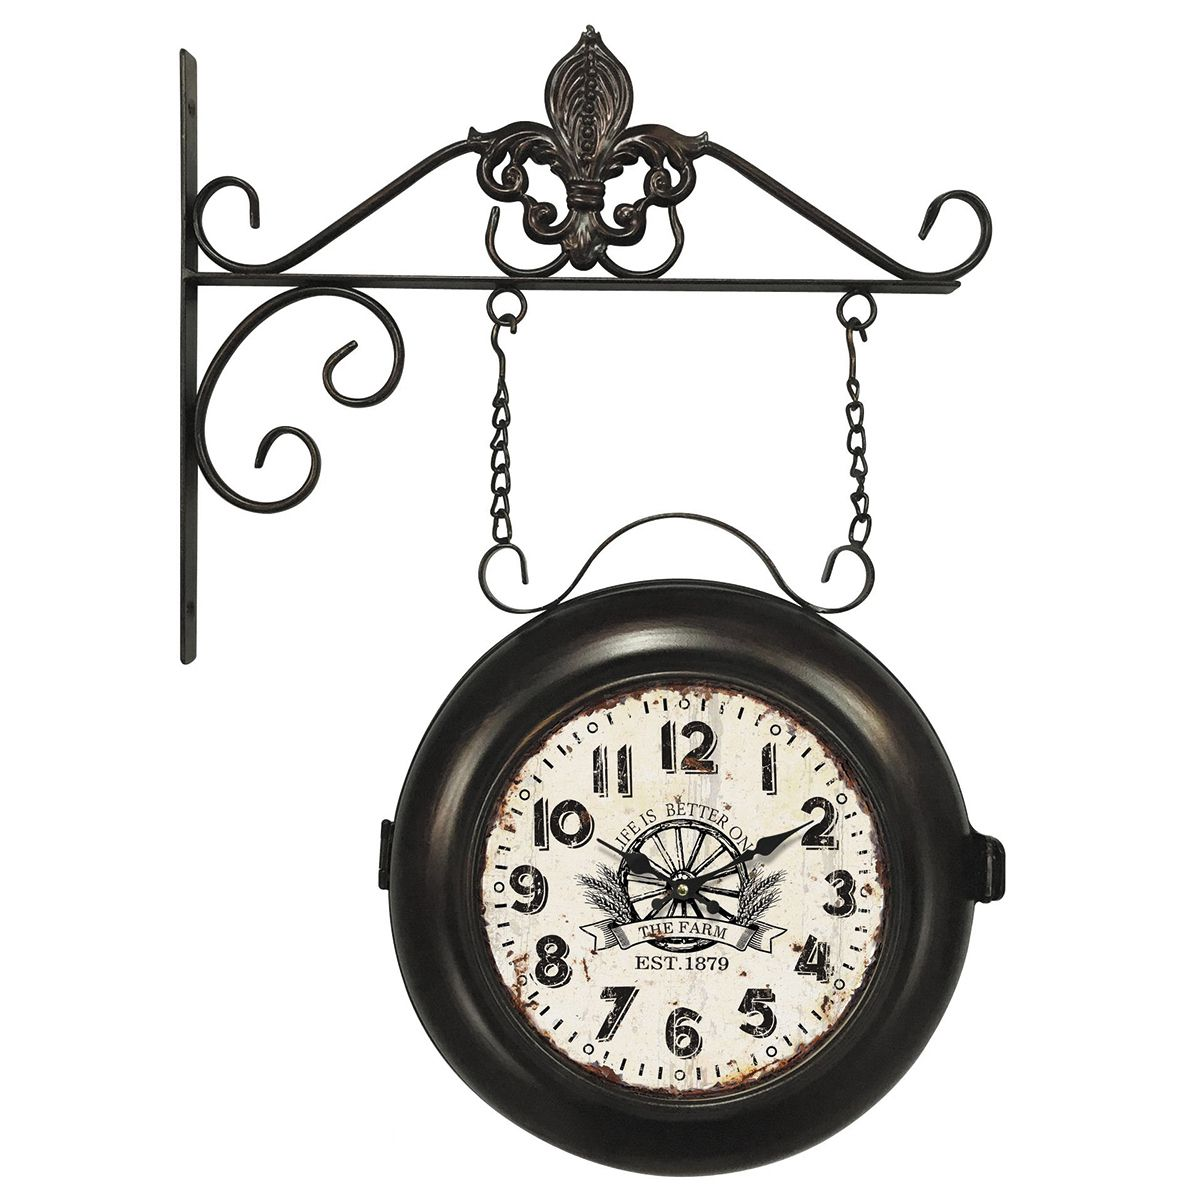 Relógio de parede dupla face c/ correntes The Farme Est.1879